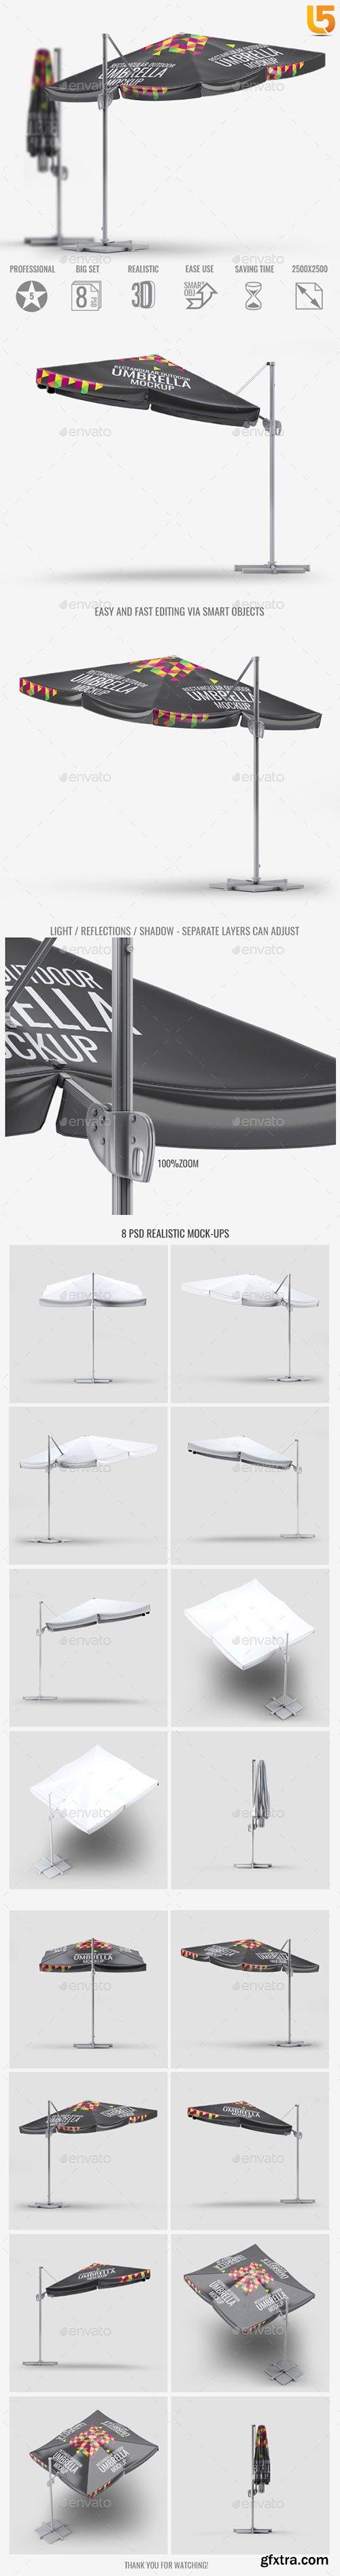 Rectangular Outdoor Umbrella Mock-Up 22834268